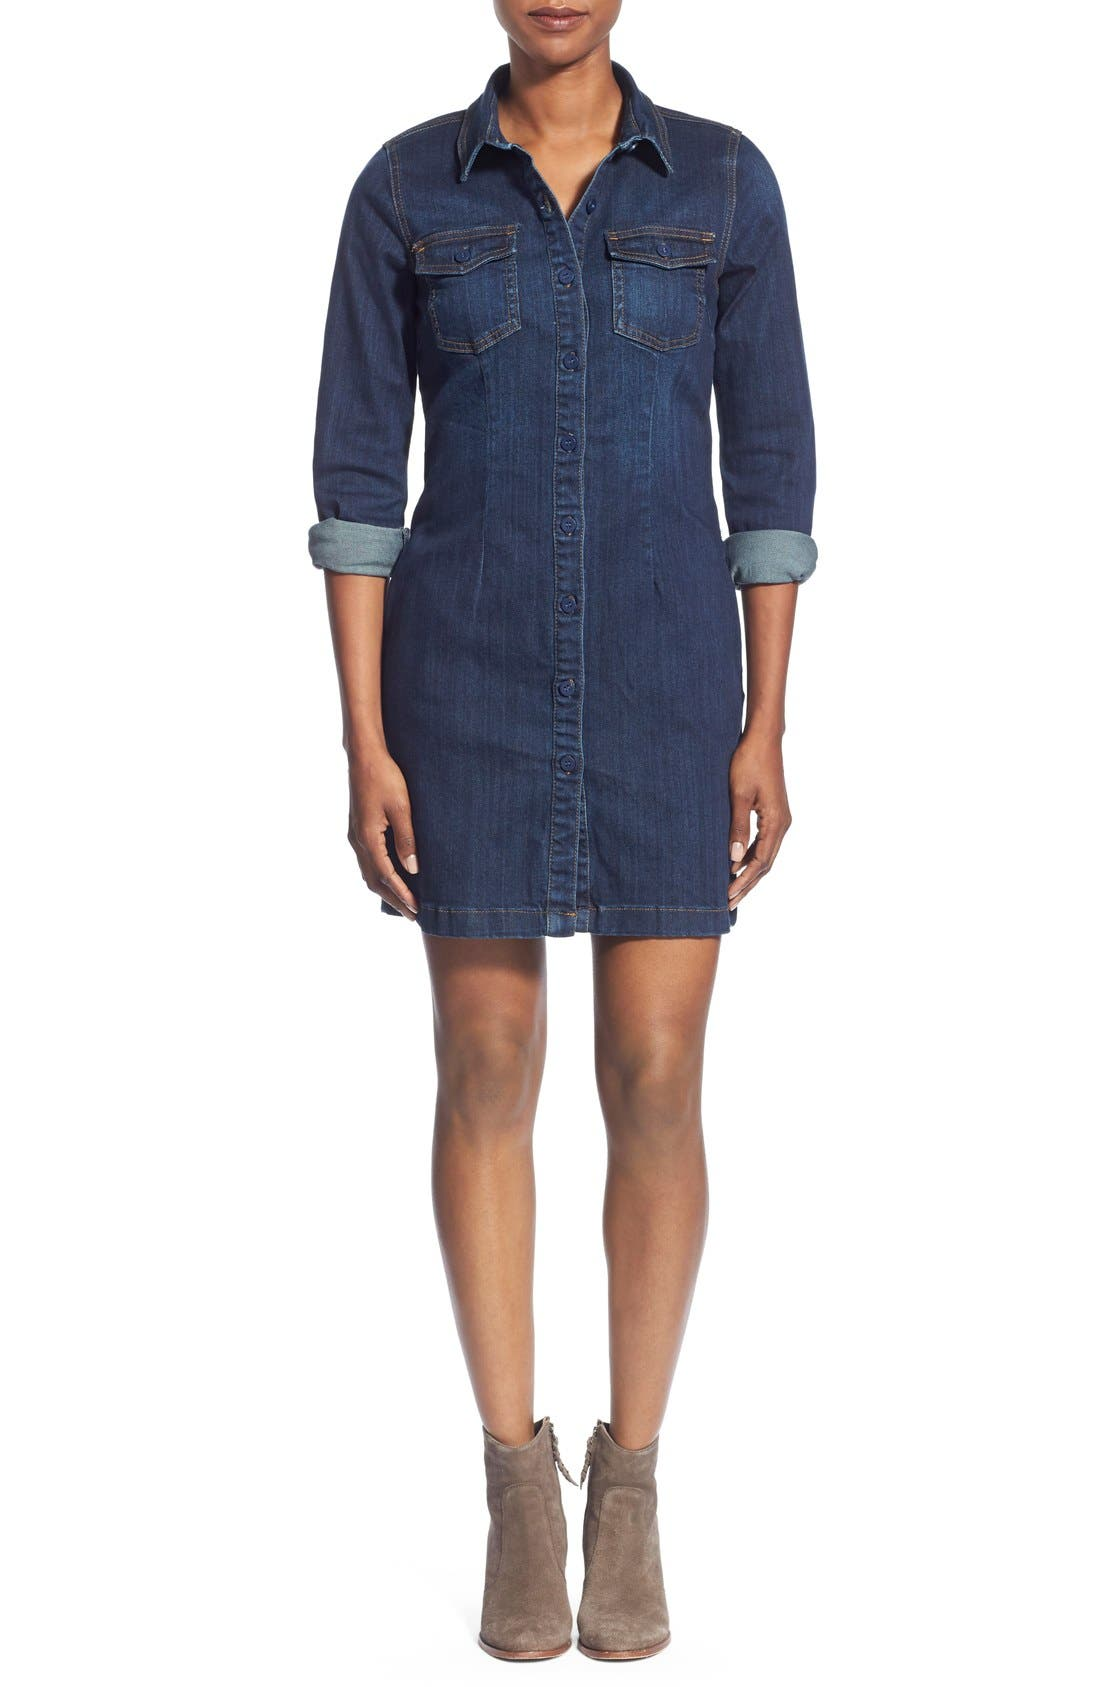 Alternate Image 1 Selected - KUT from the Kloth 'Blake' Denim Shirt Dress